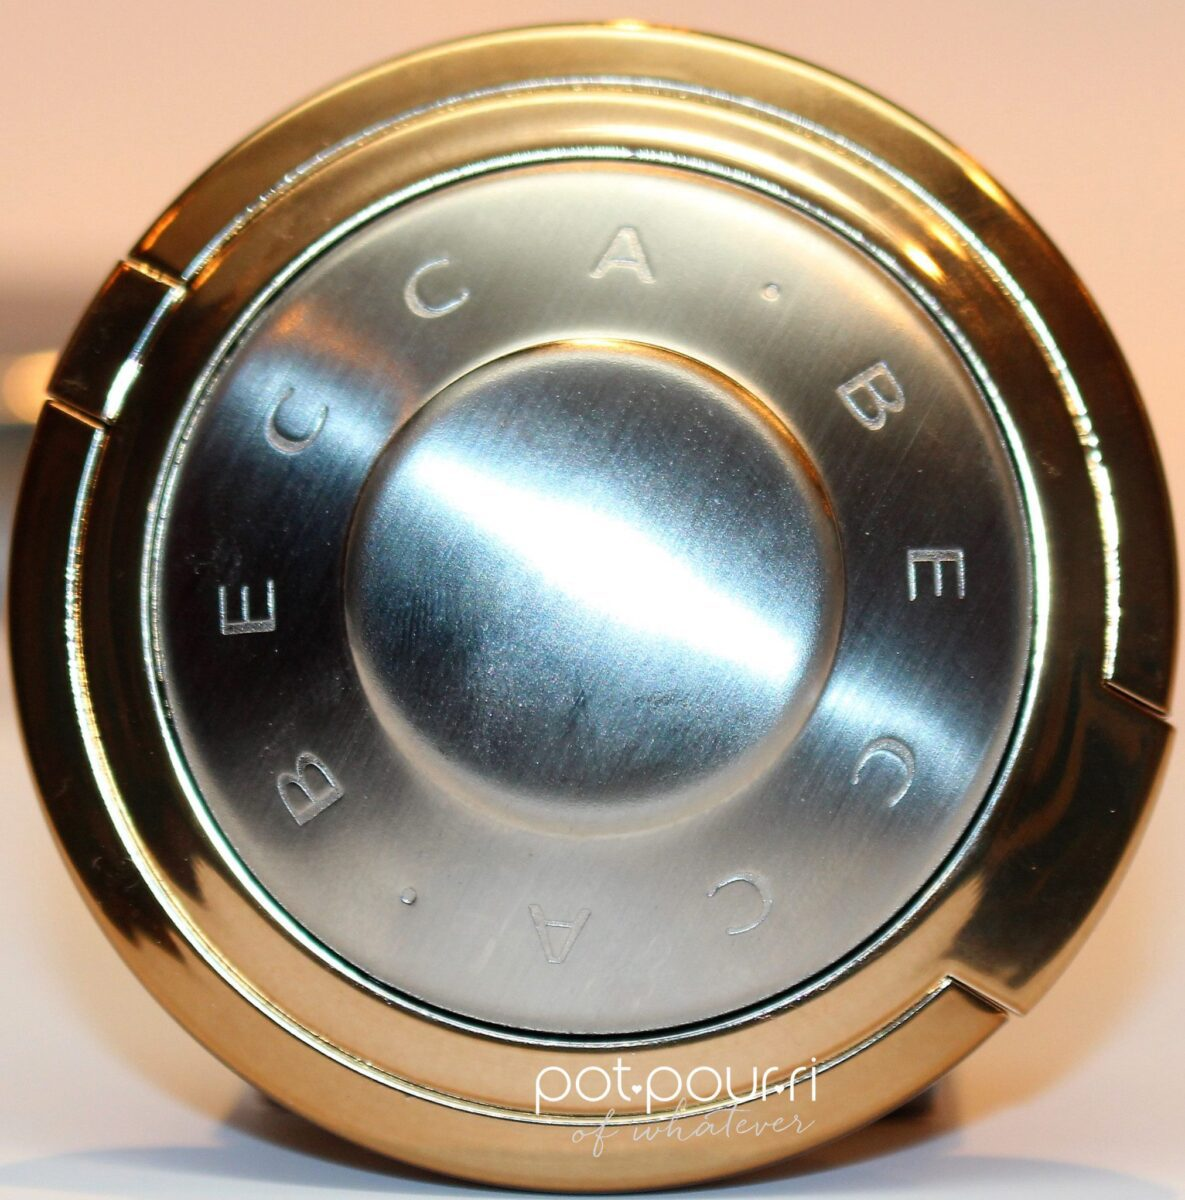 Becca-Light-Chaser-Highlighter-compact-smaller-than-original